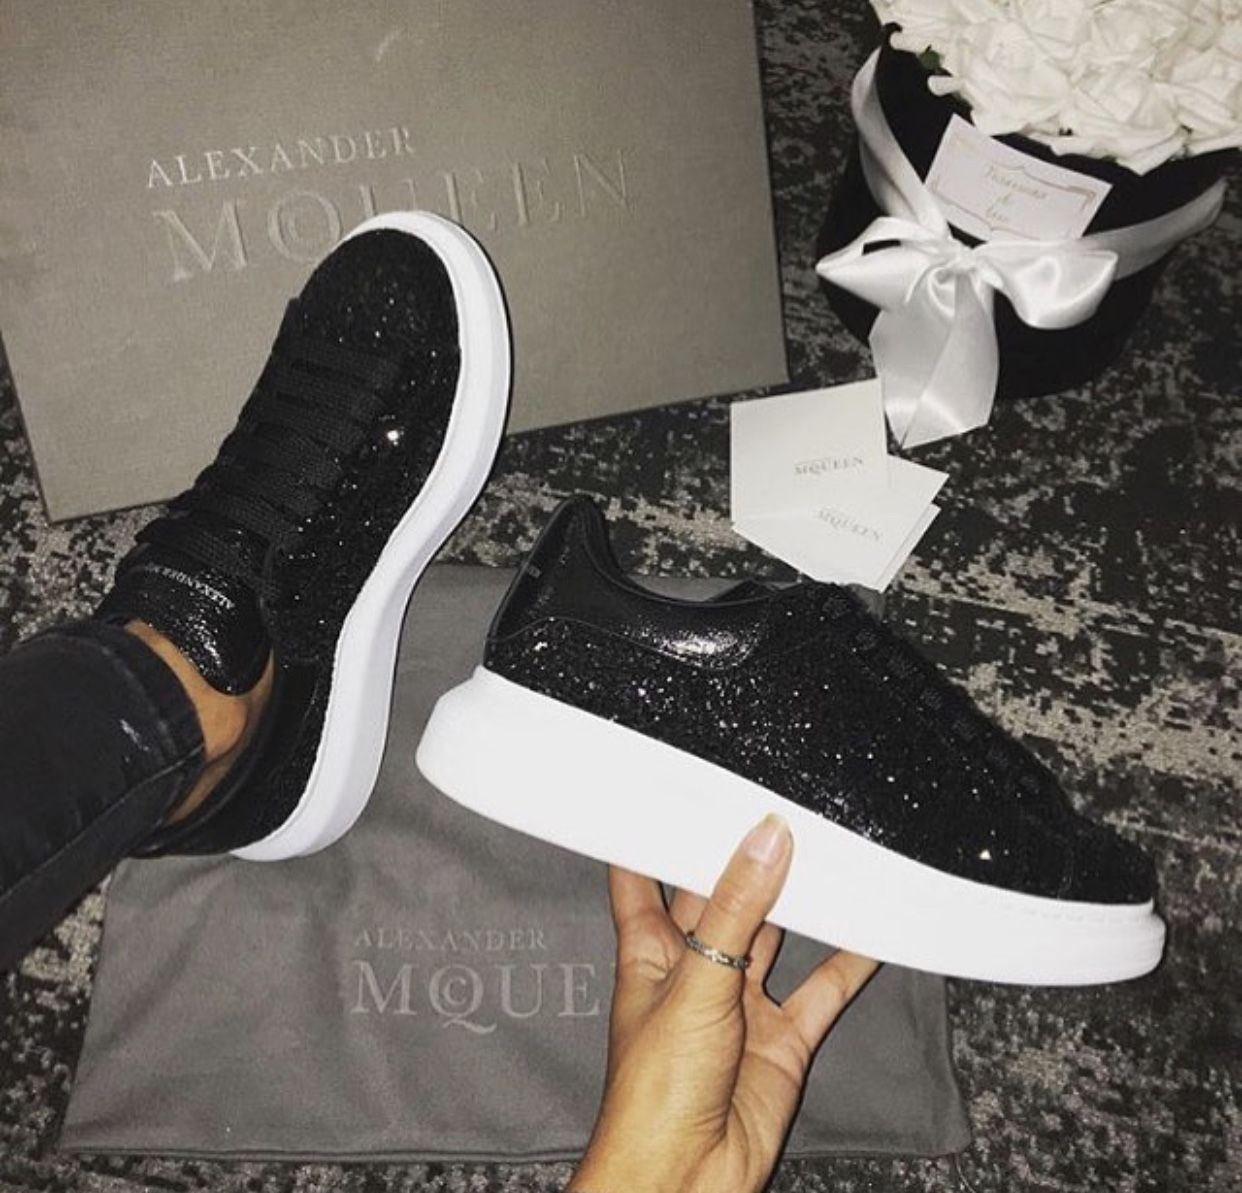 Shoe boots, Alexander mcqueen shoes